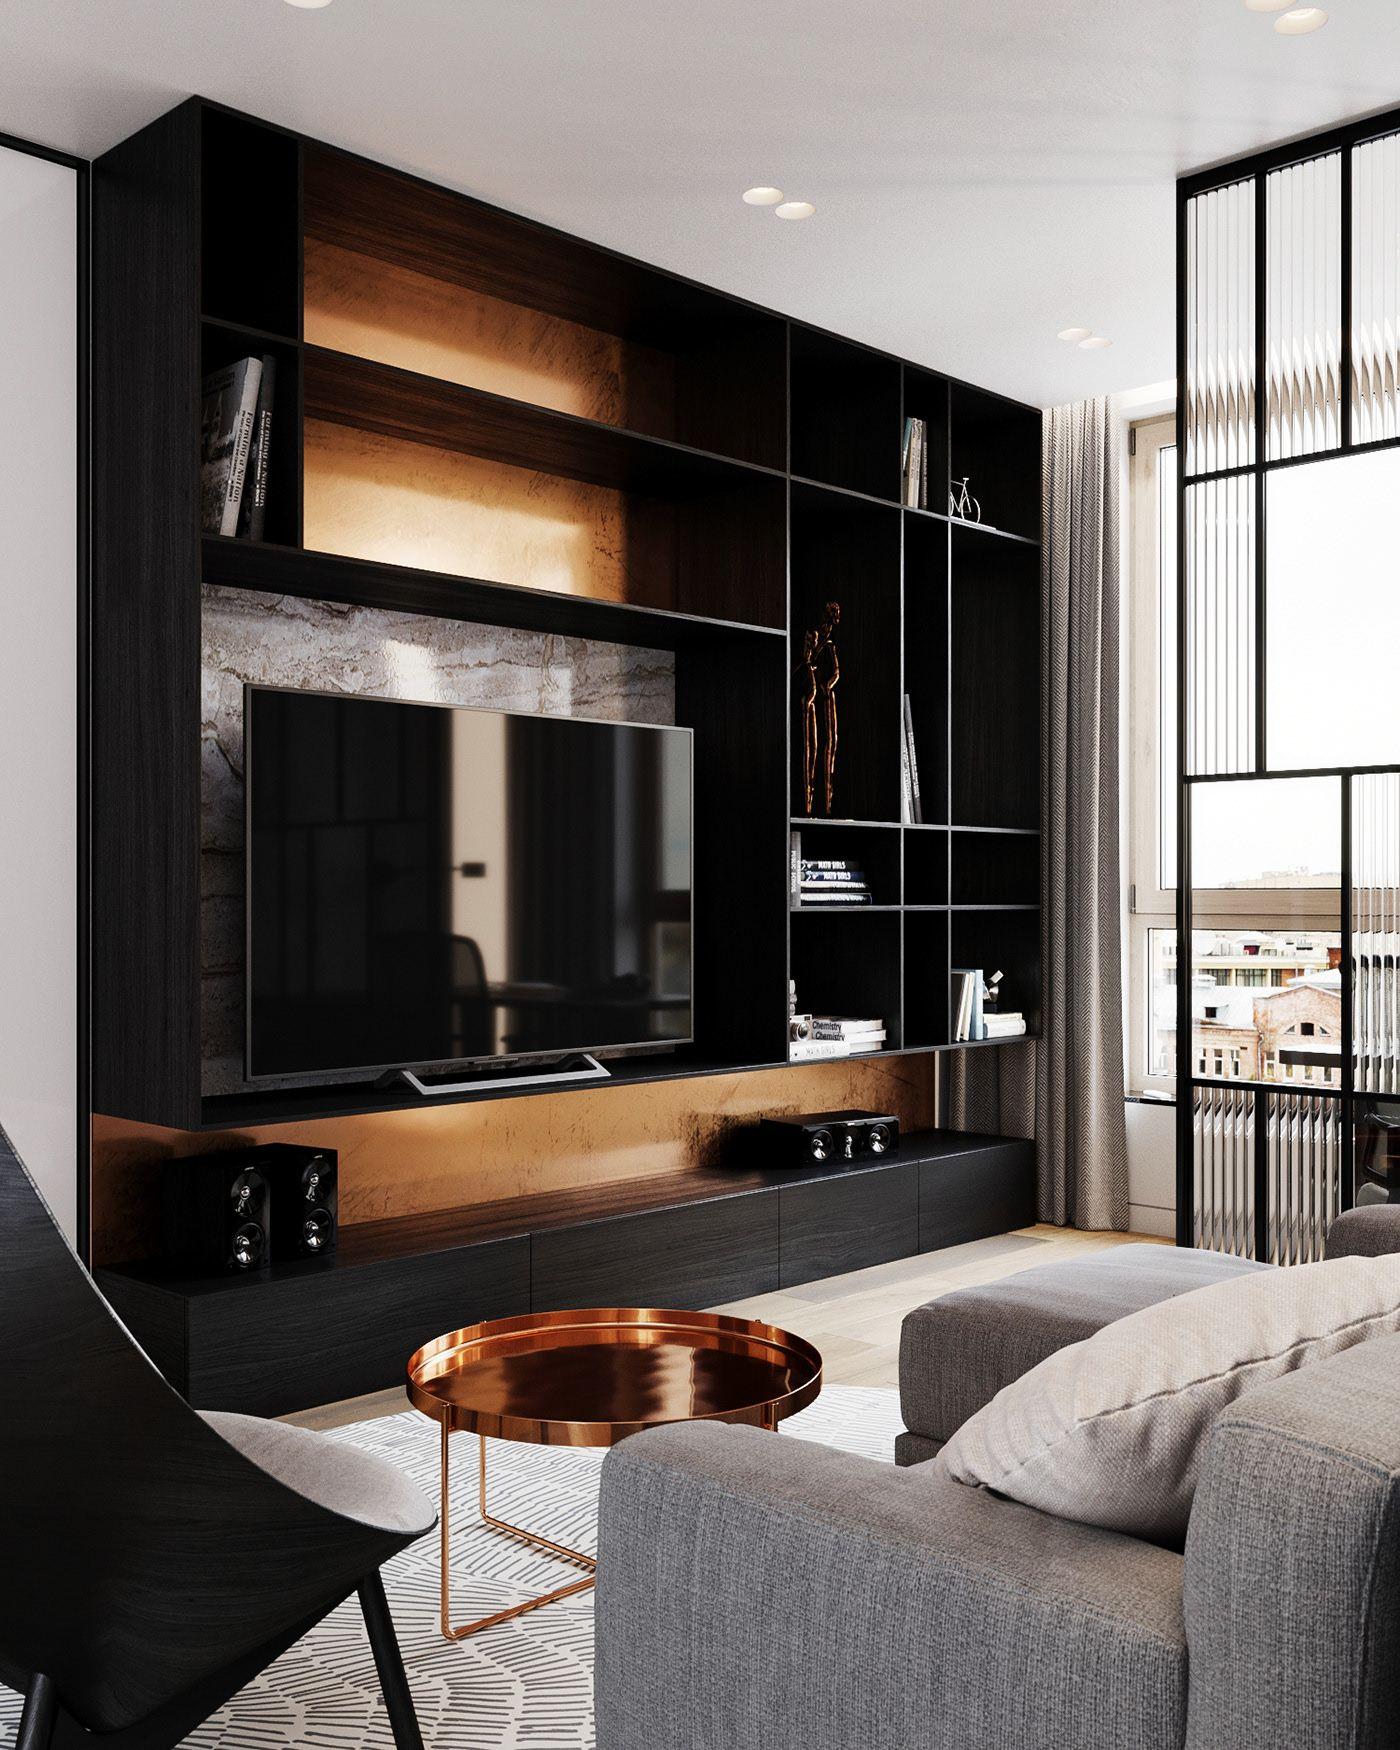 Behance For You New bedroom design, Flat design, Interior